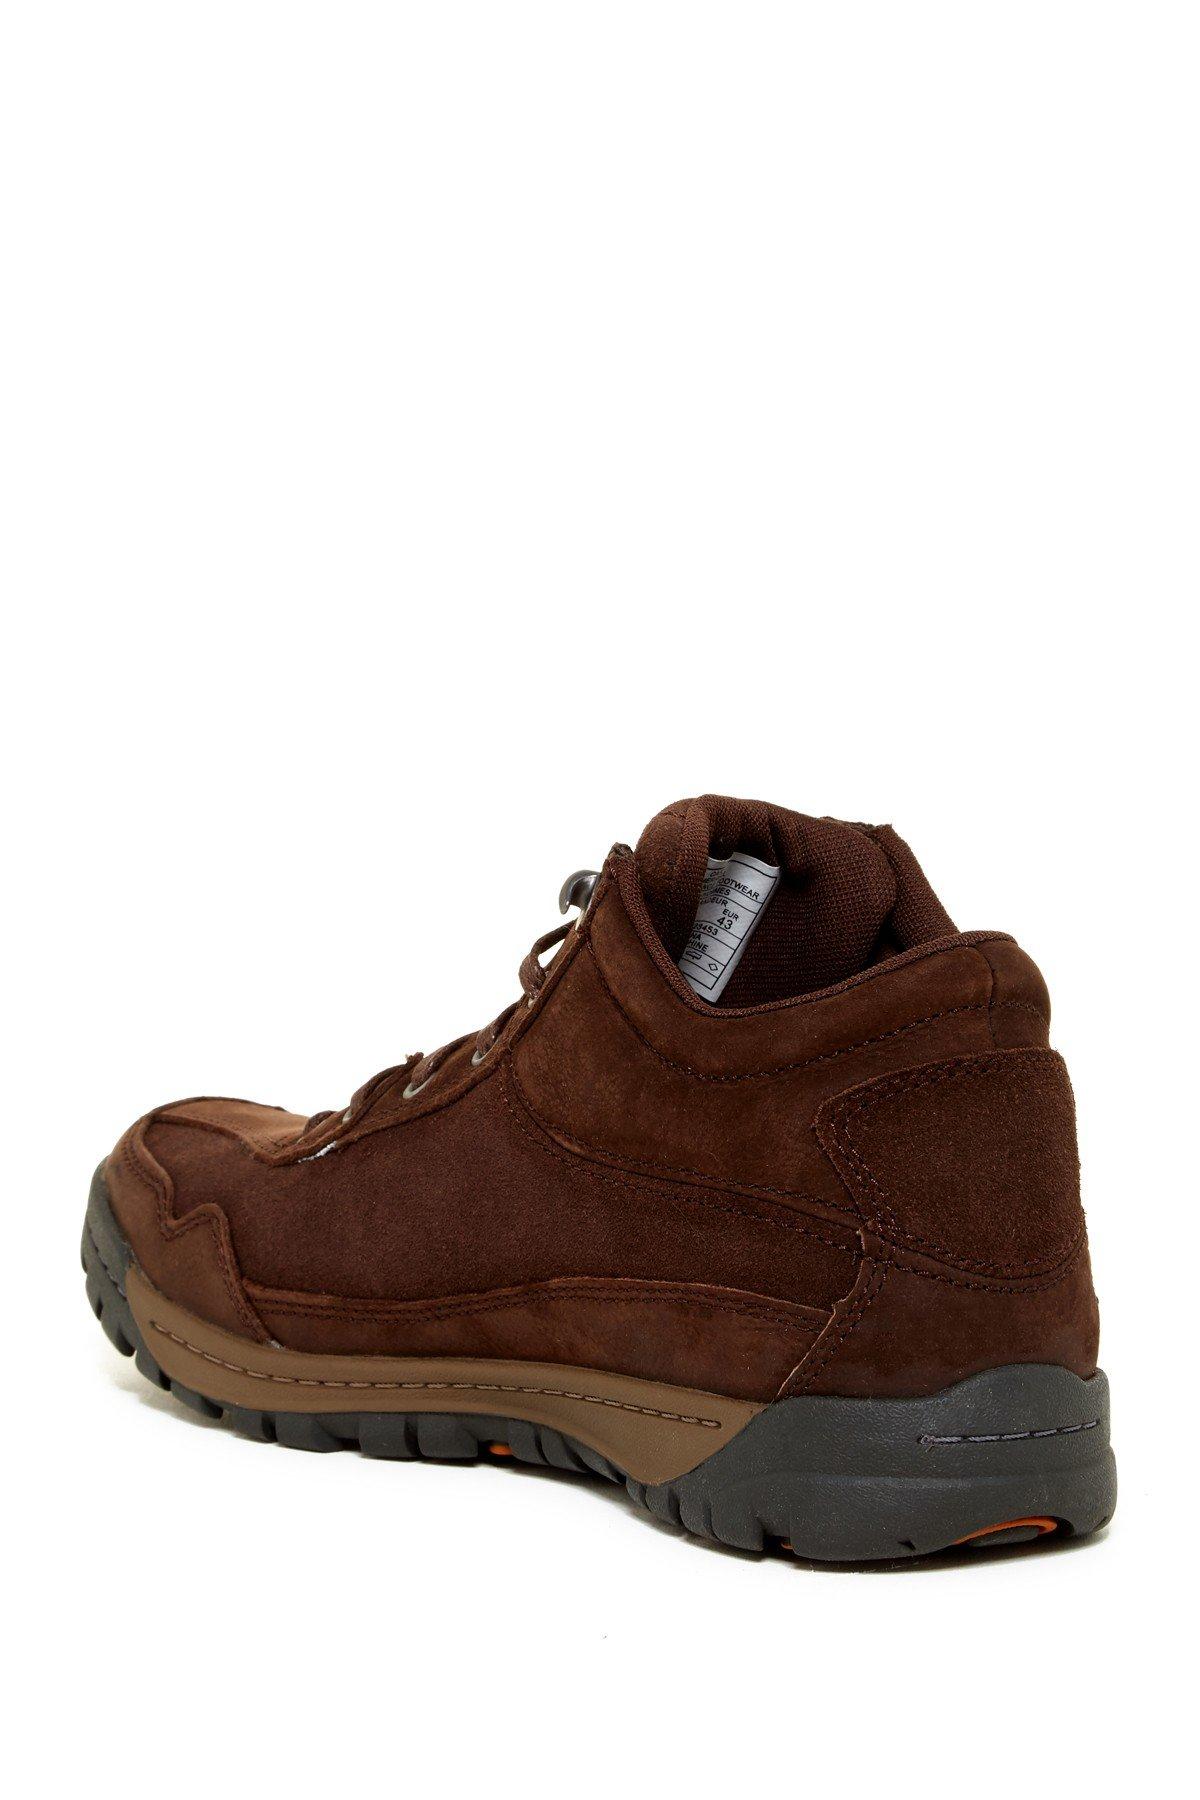 Lyst Merrell Traveler Field Mid Hiking Boot In Brown For Men